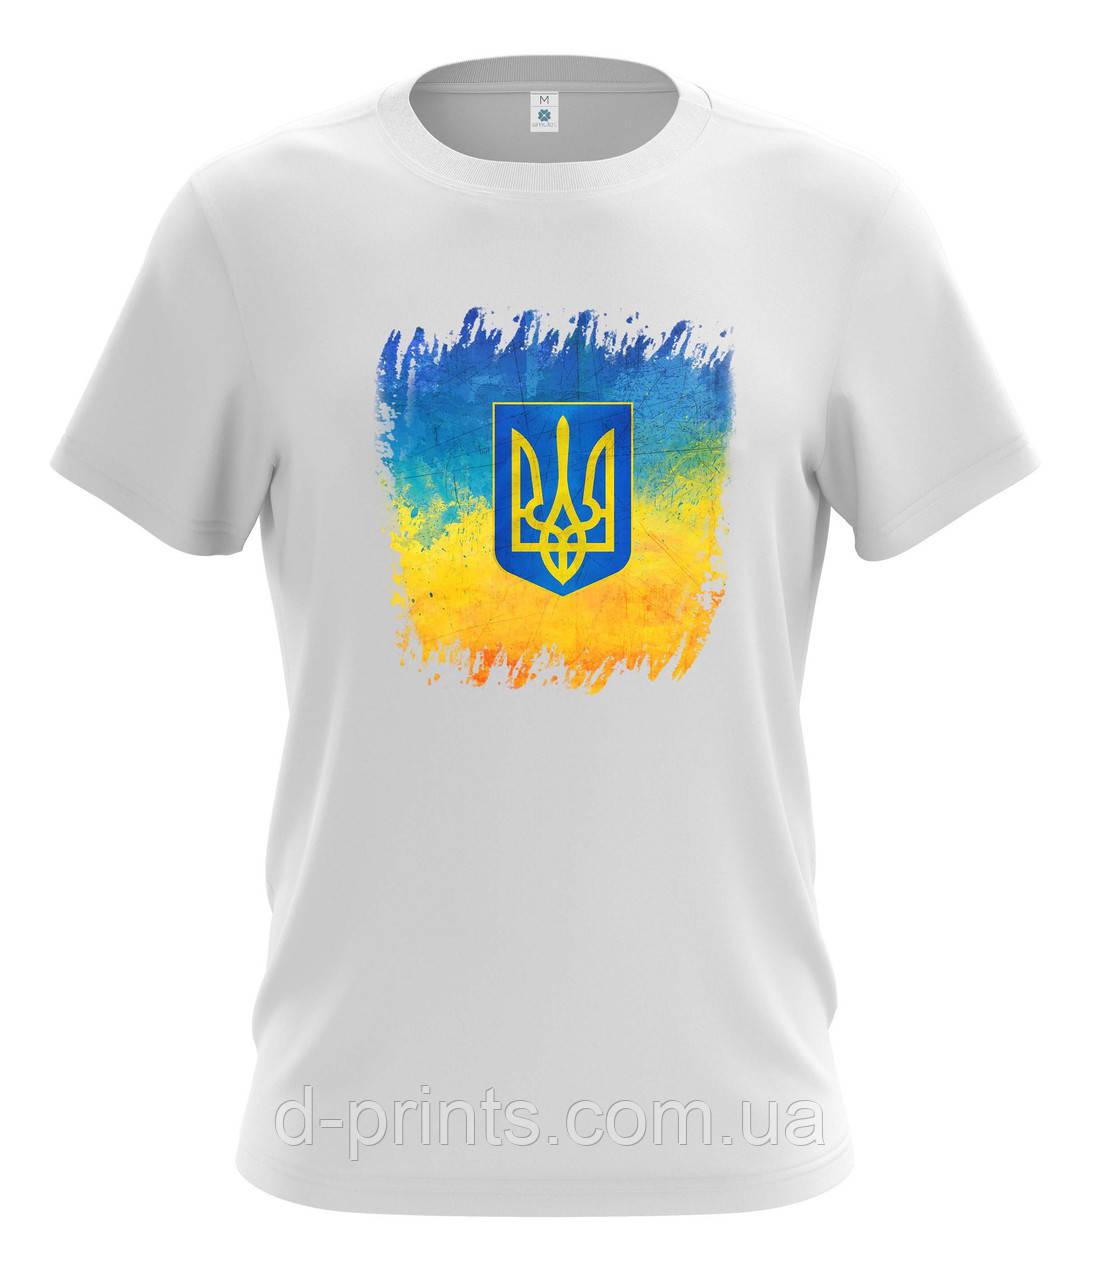 "Футболка мужская с рисунком ""Украина"" MF-12-74"